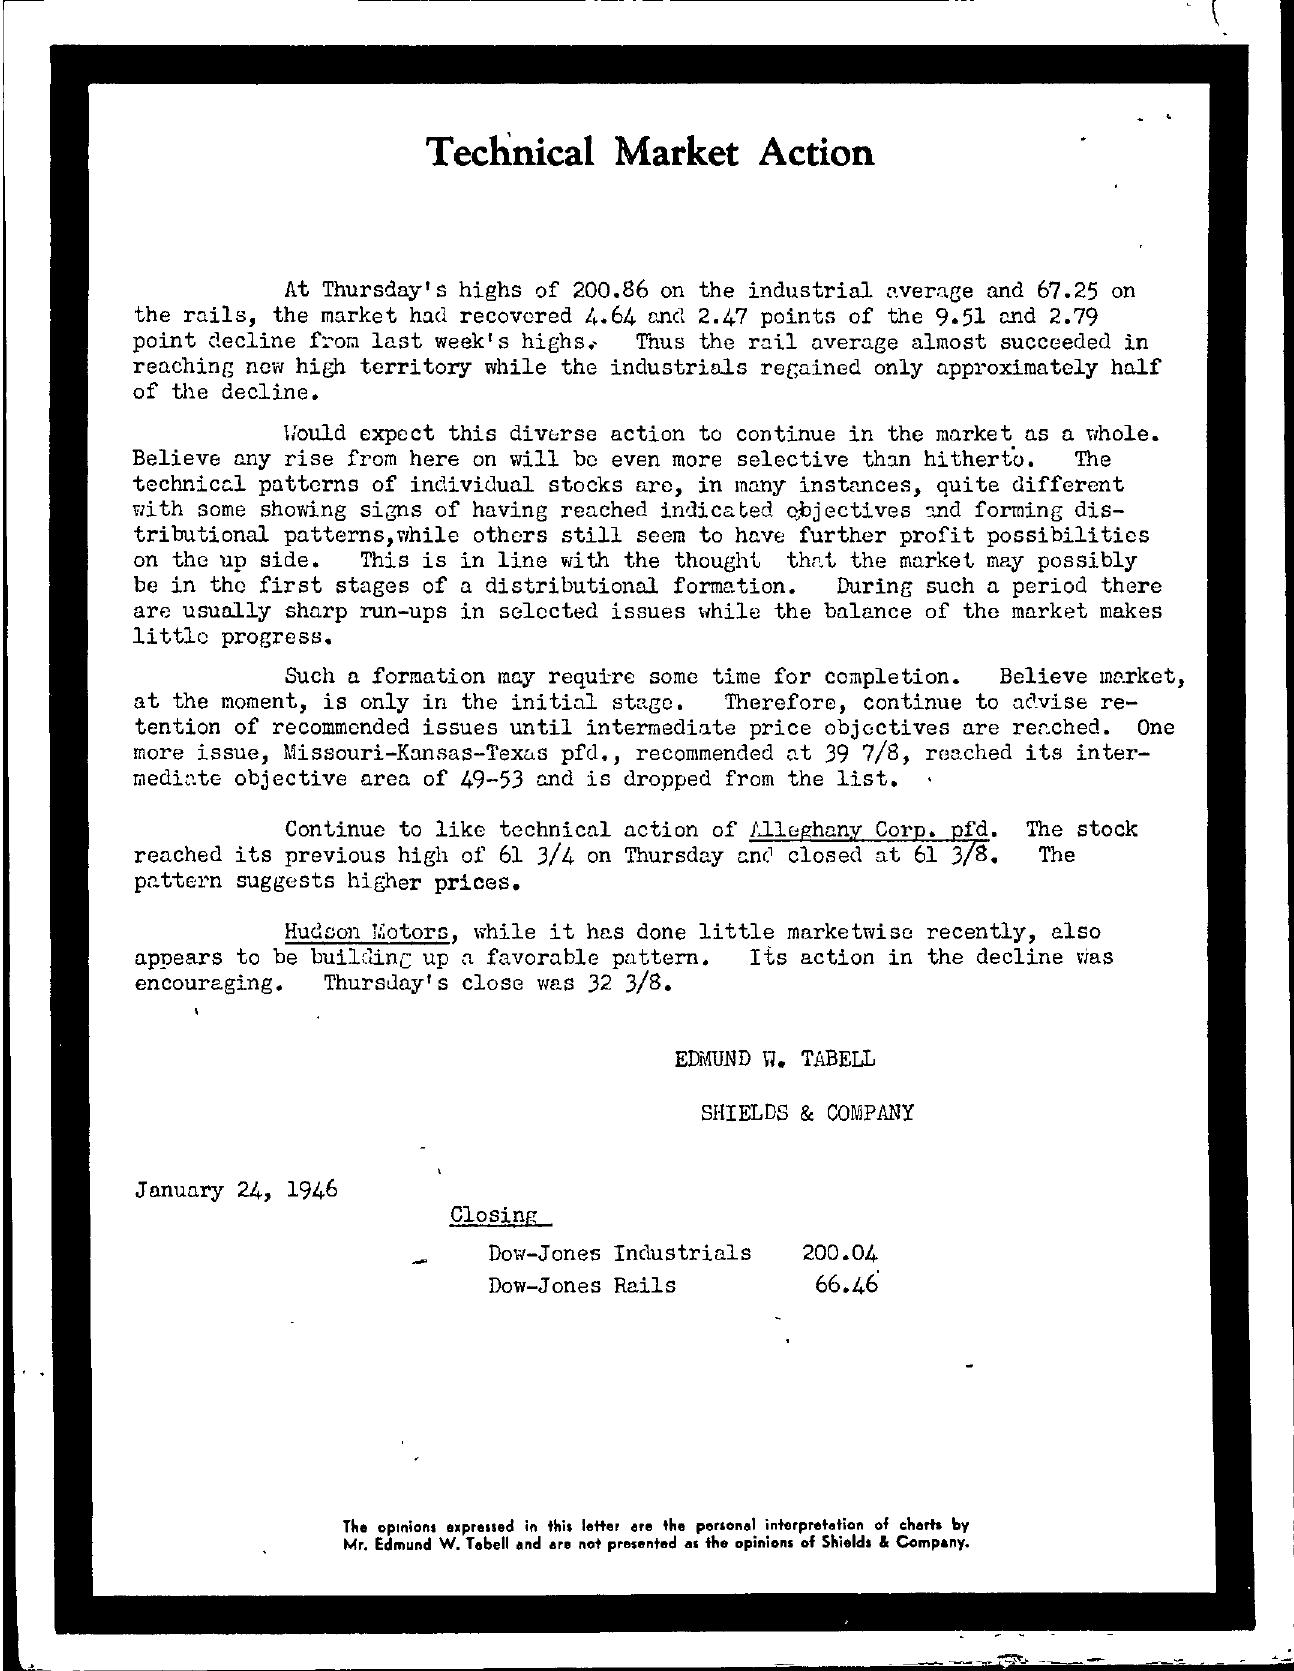 Tabell's Market Letter - January 24, 1946